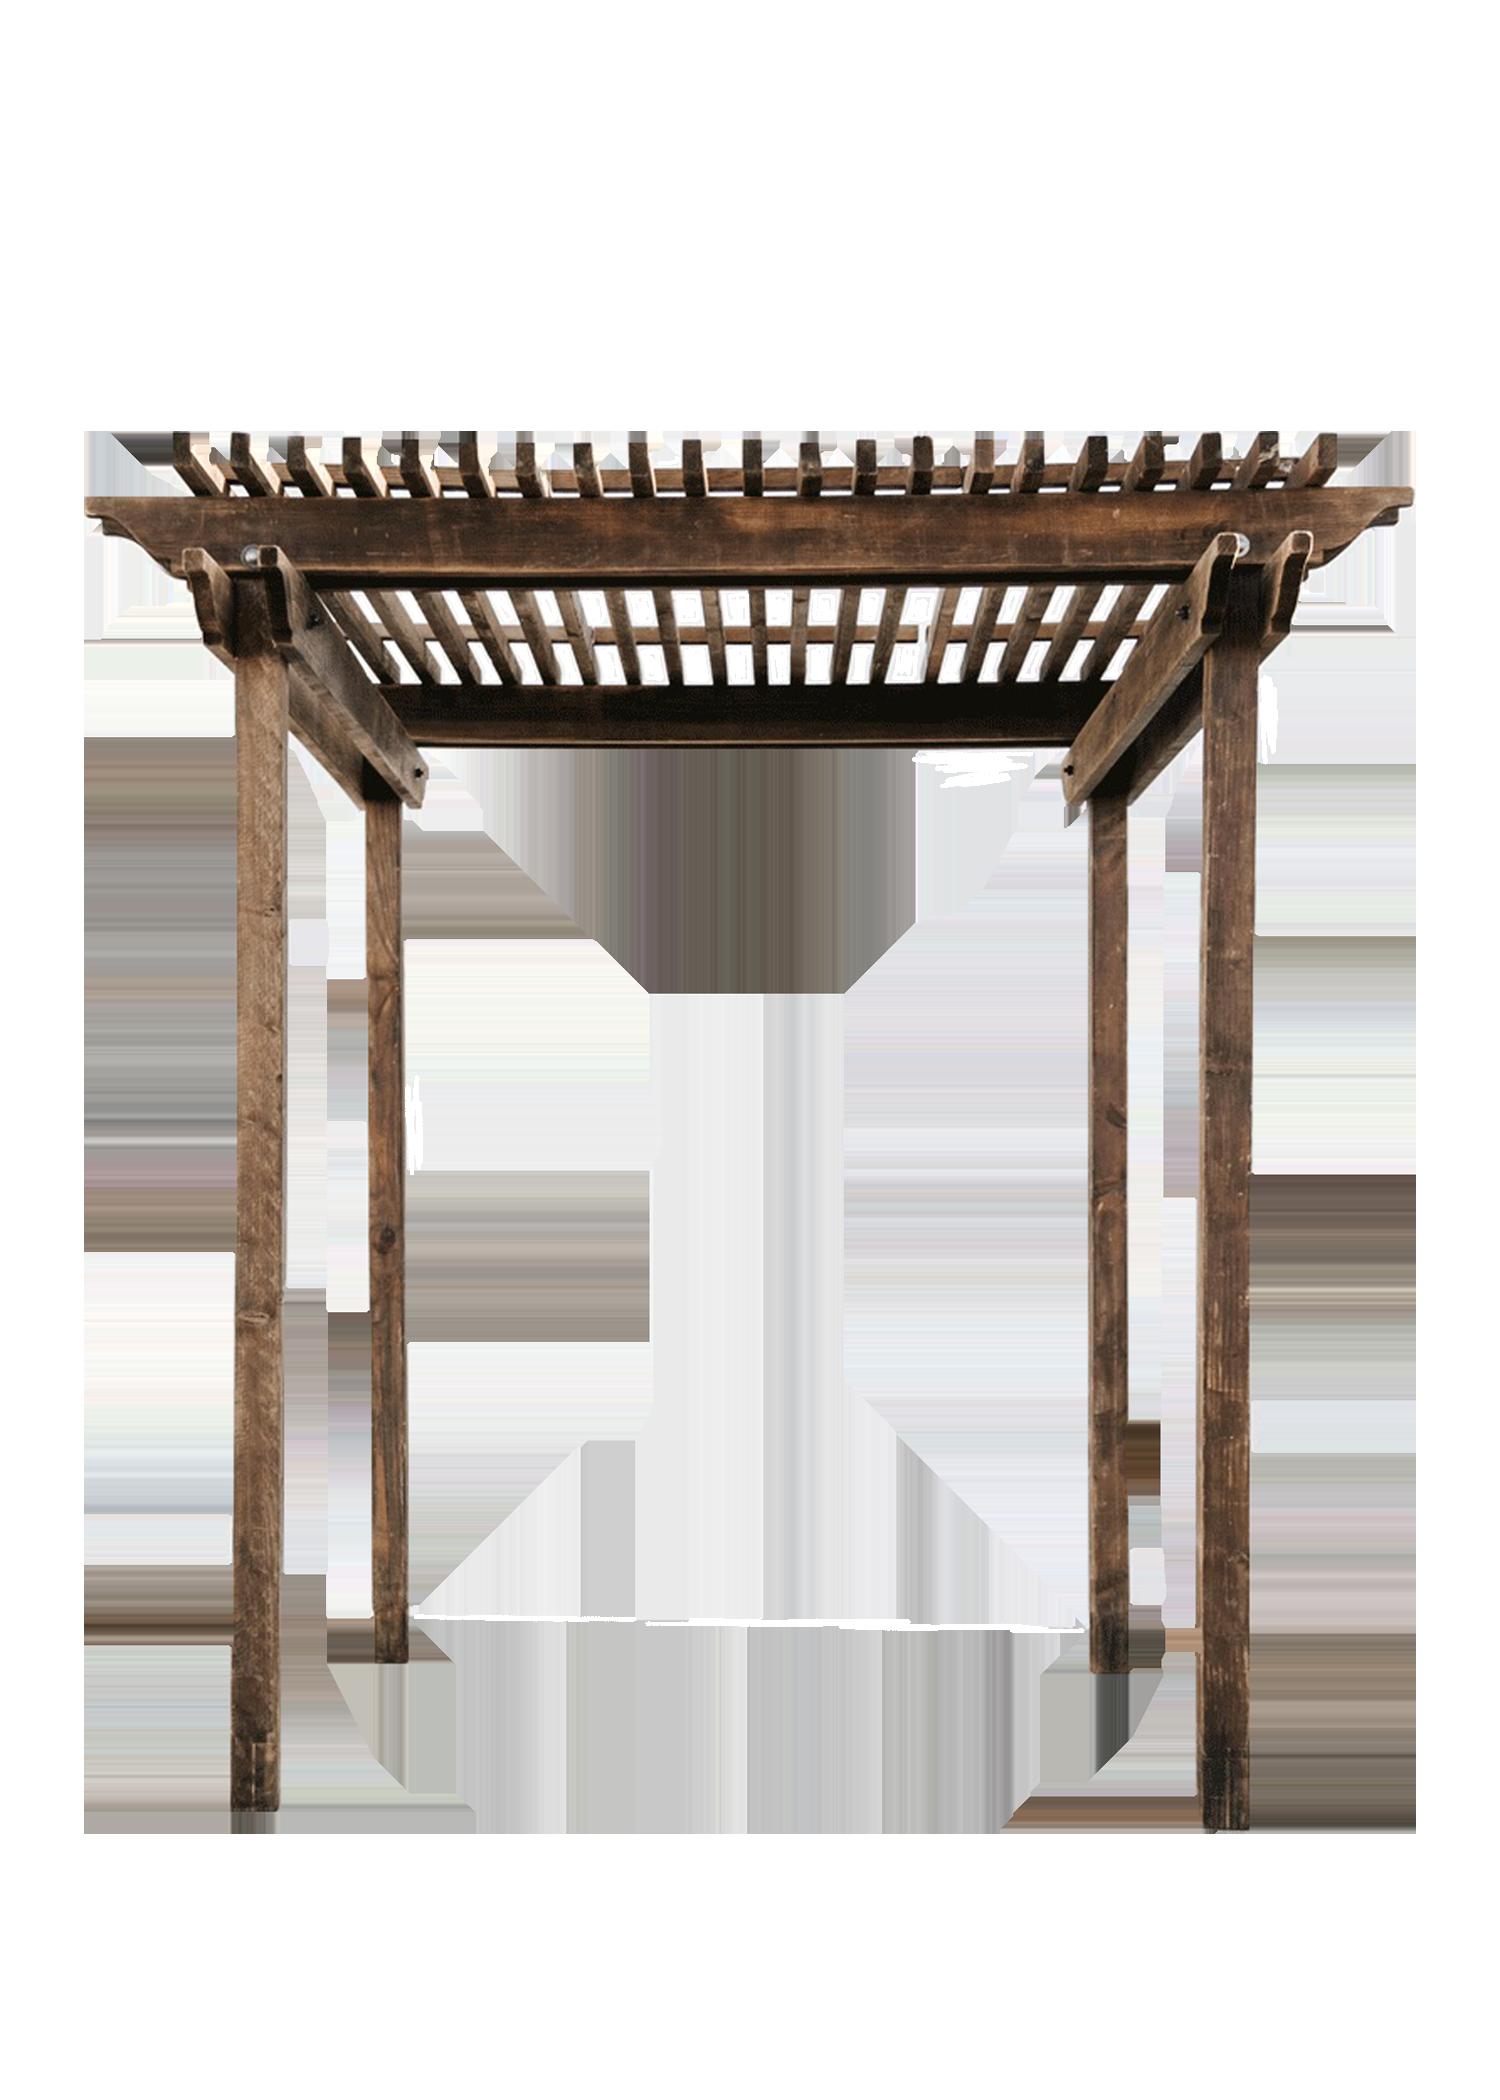 Megan's Arch